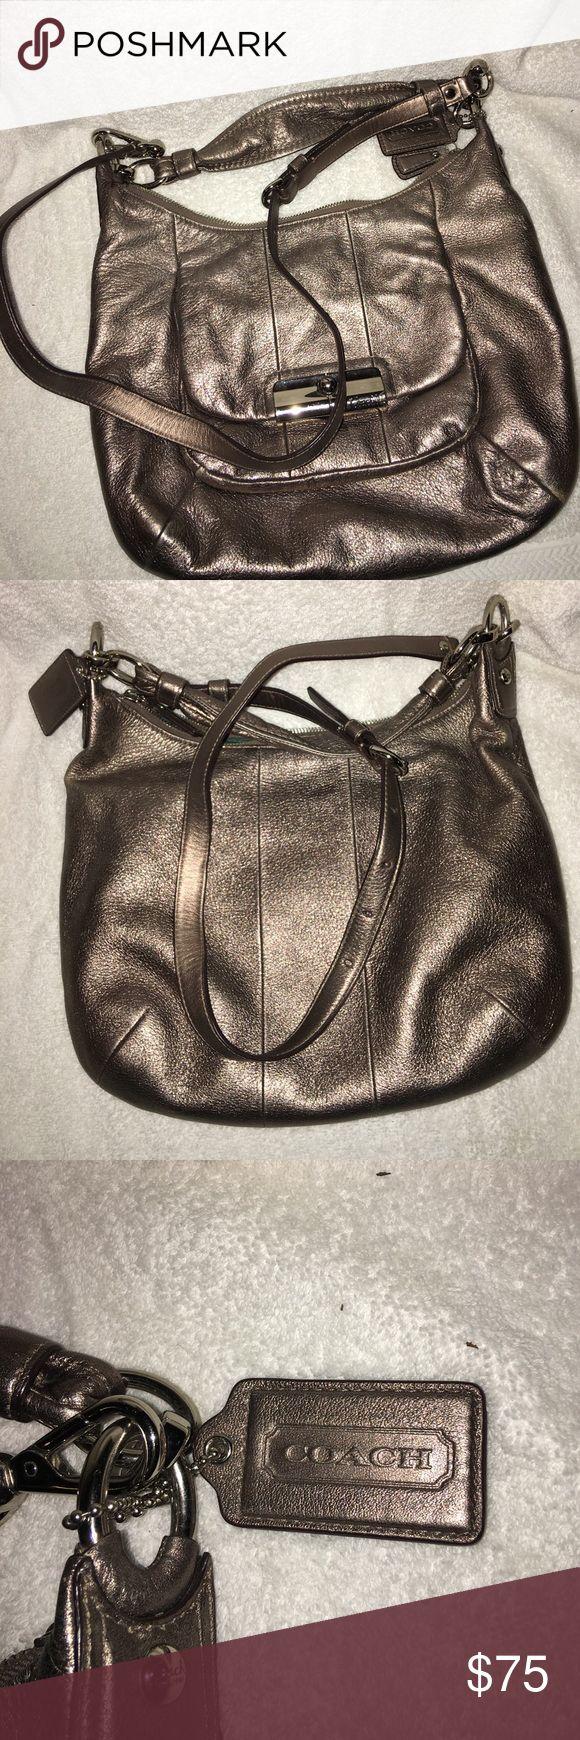 Pewter color Coach hobo bag Excellent condition has handle strap and shoulder strap Coach Bags Hobos